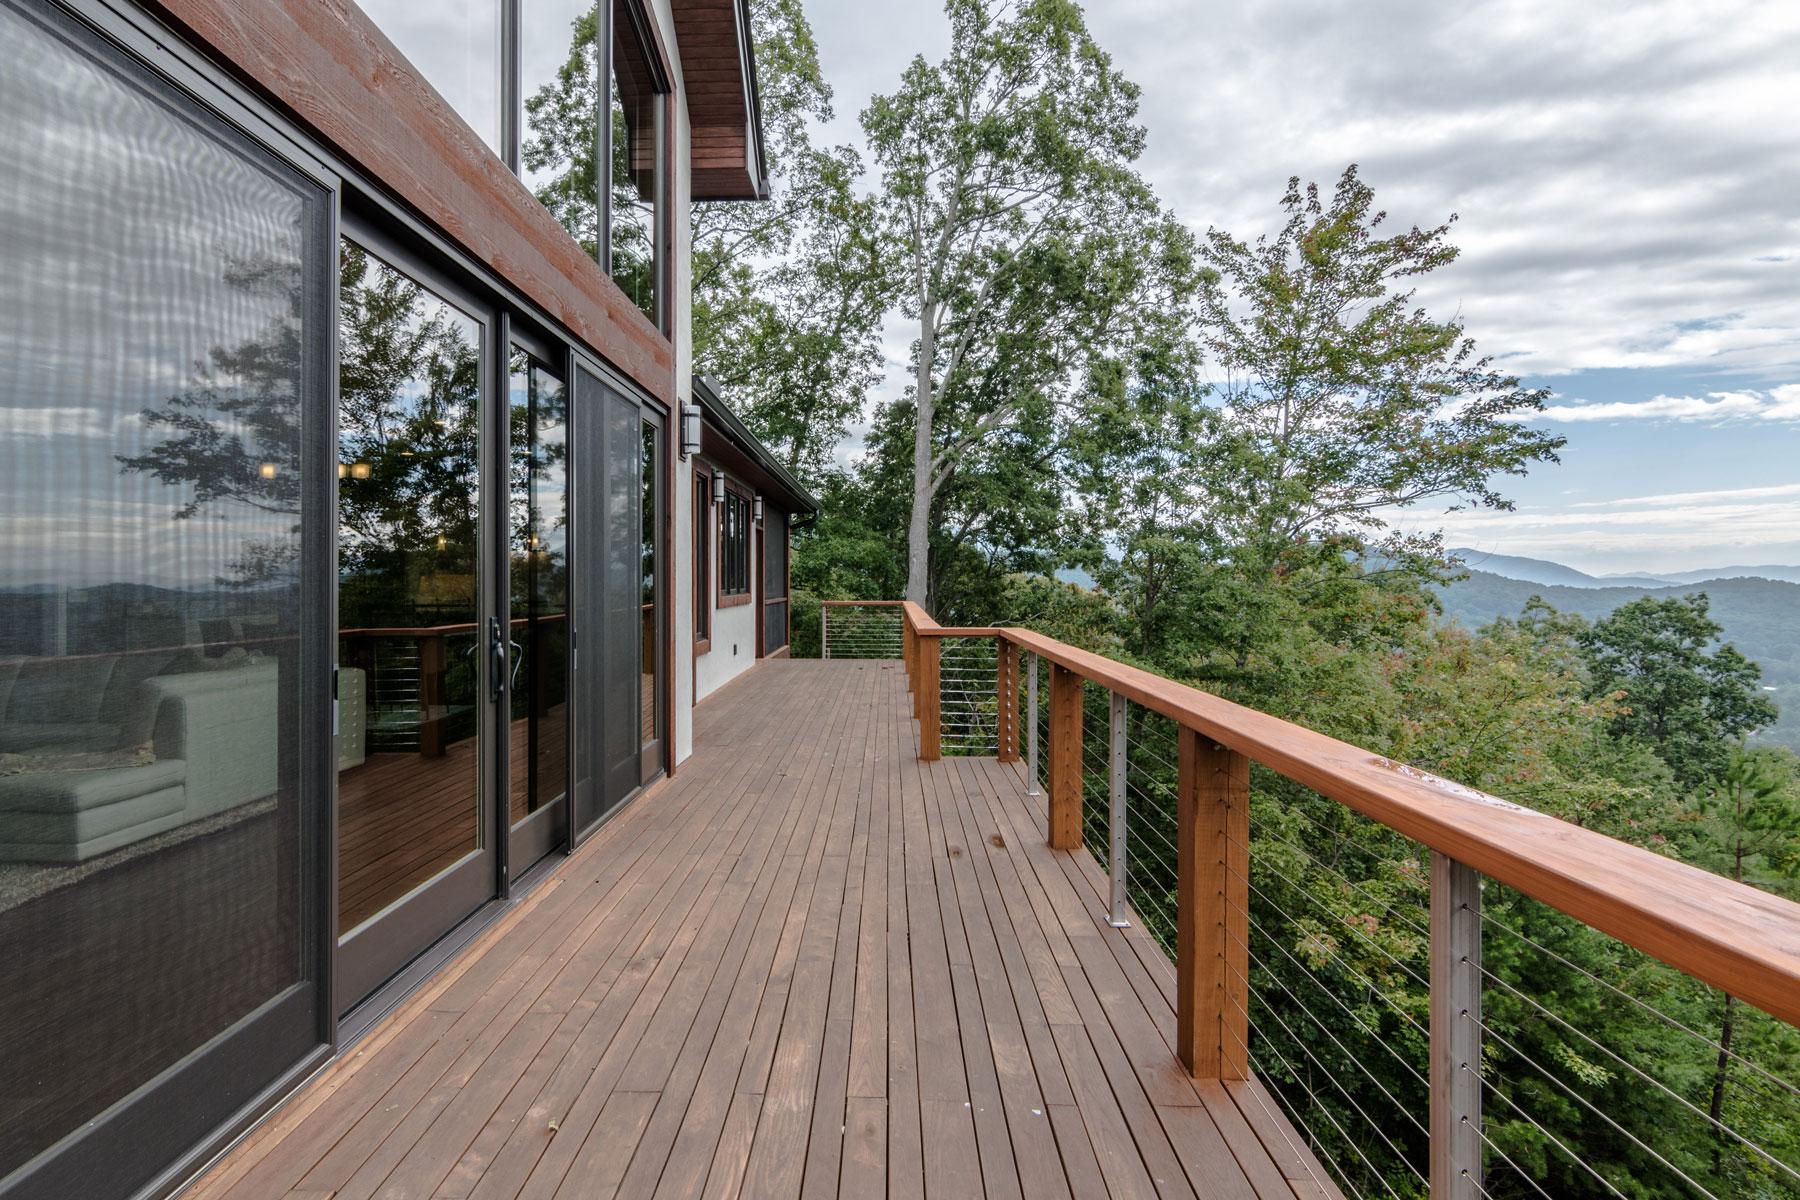 rear-deck-modern-railings-long-range-mountain-views